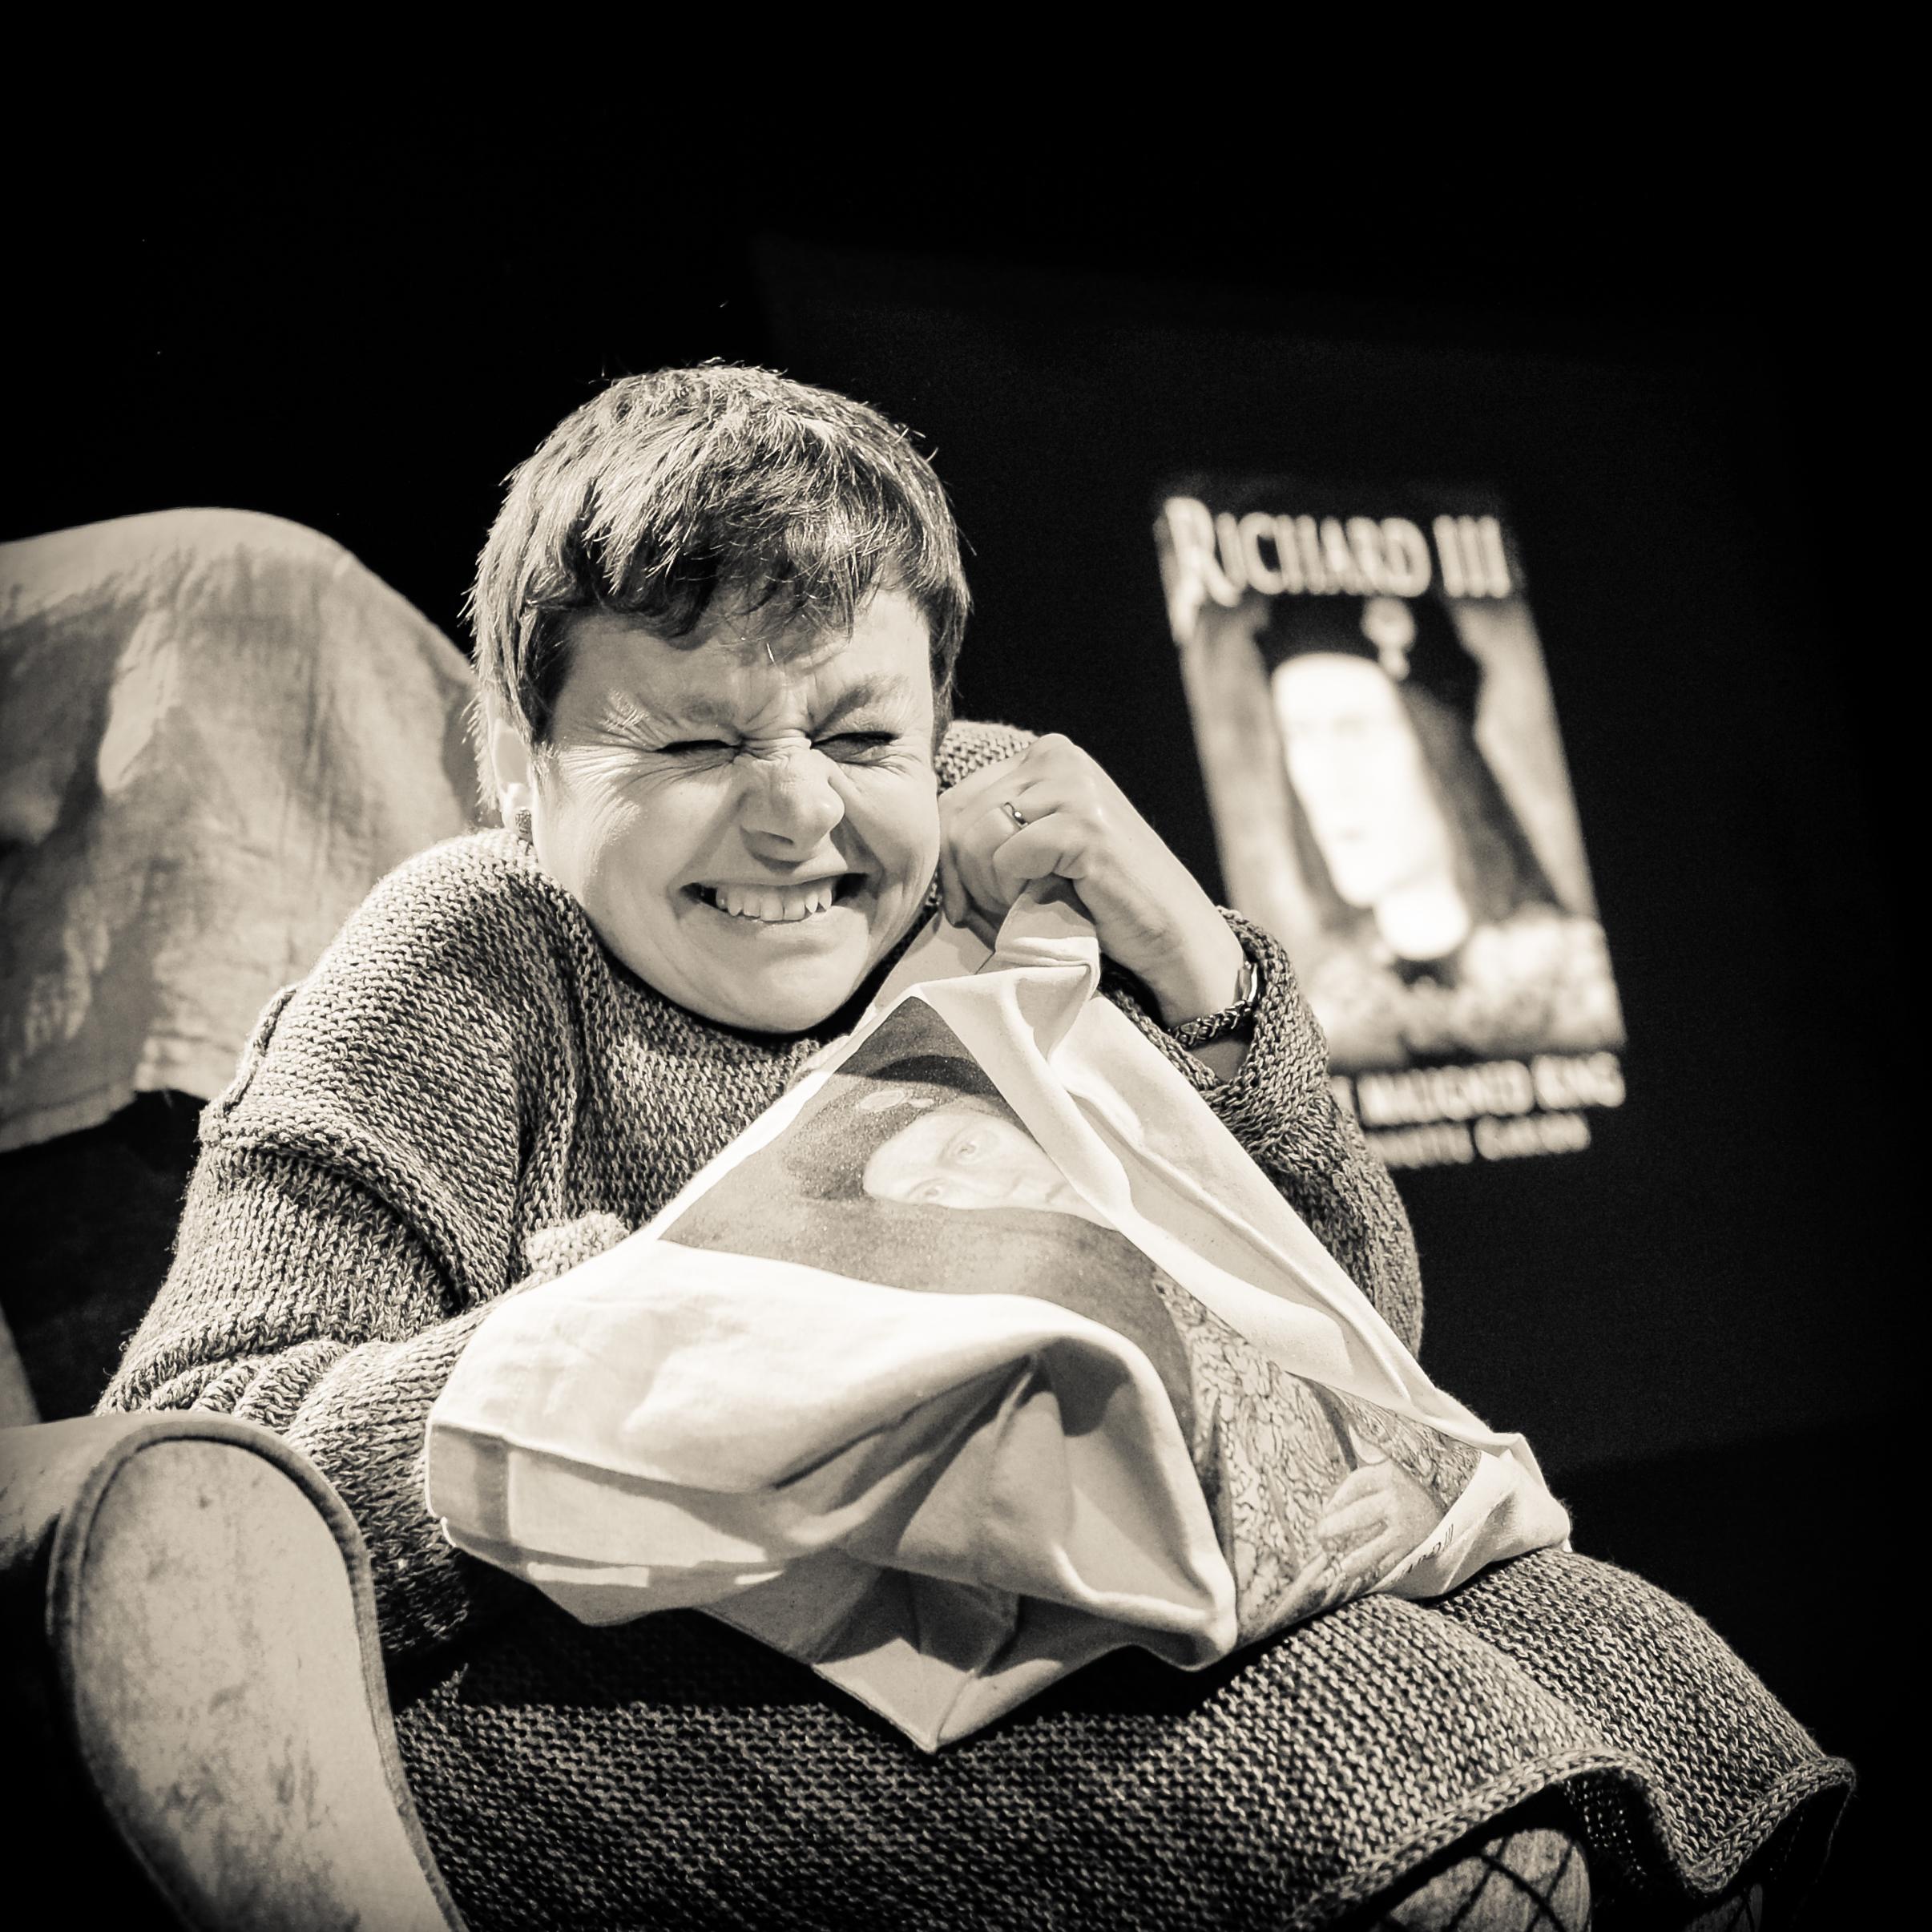 Sara Beer in  richard III redux: 'Stories at Nan's' (panopticphotography]